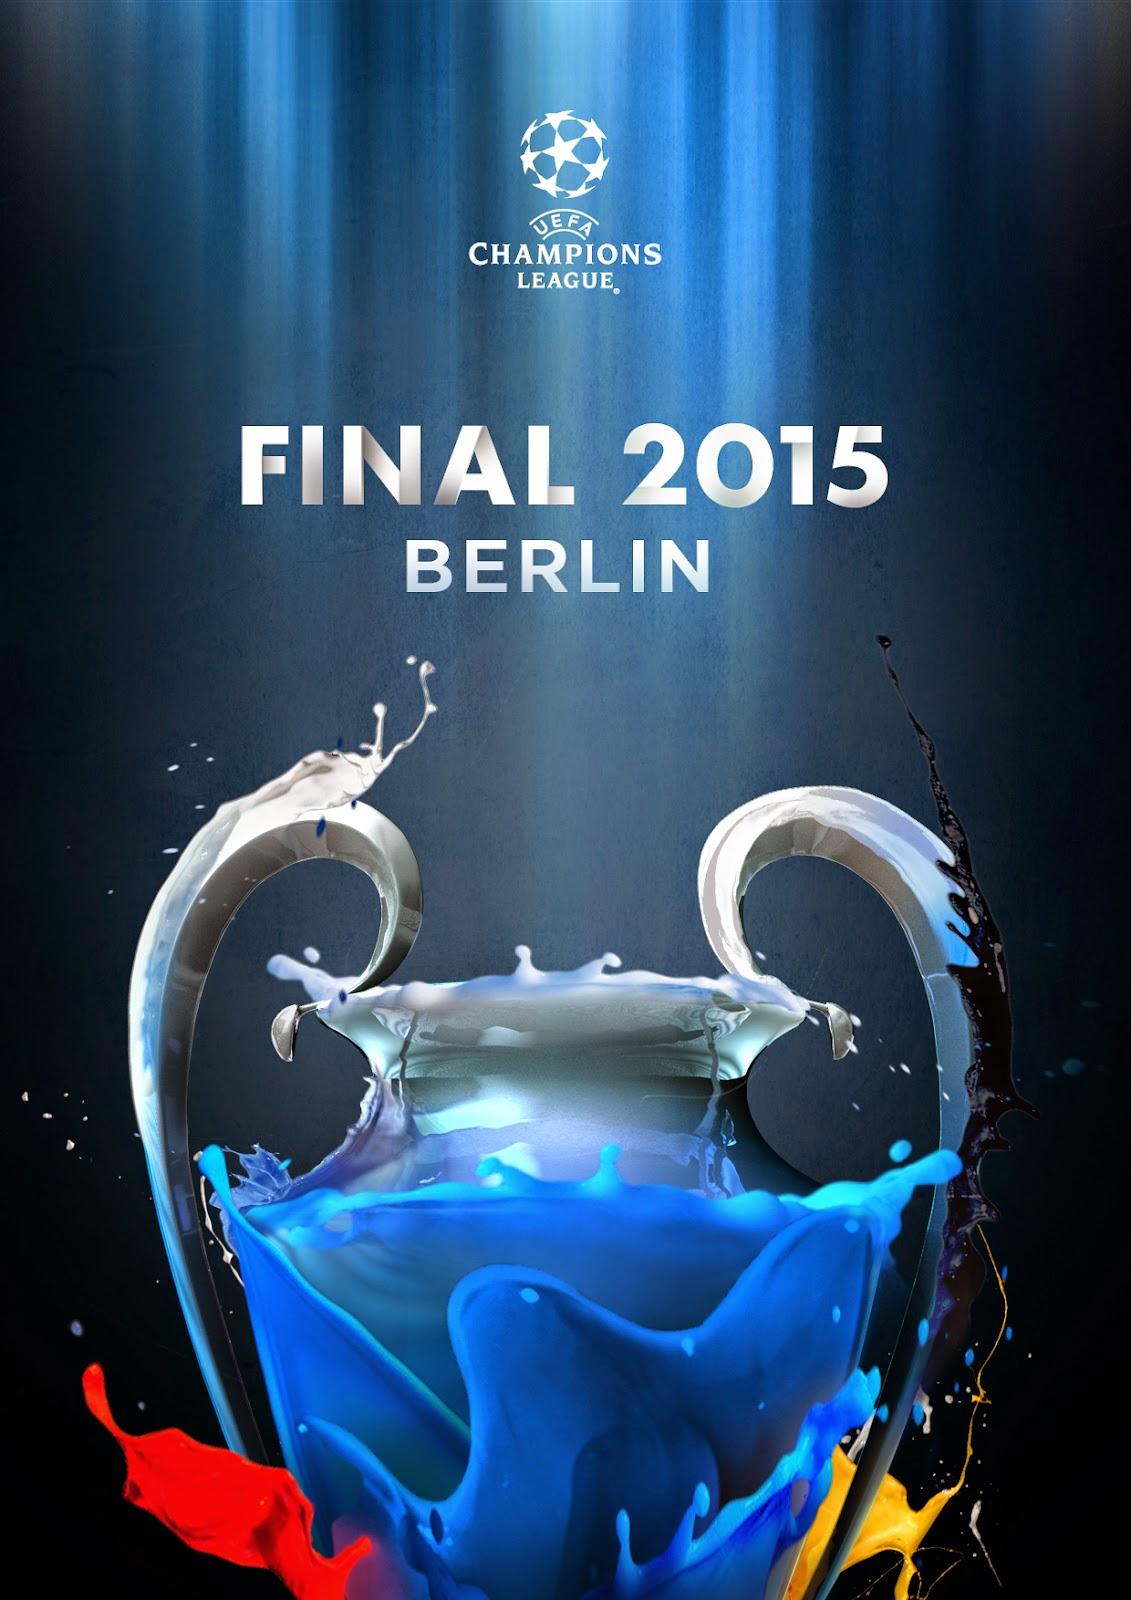 champions league final berlin 2015 dr3am linguaschools barcelona blog. Black Bedroom Furniture Sets. Home Design Ideas